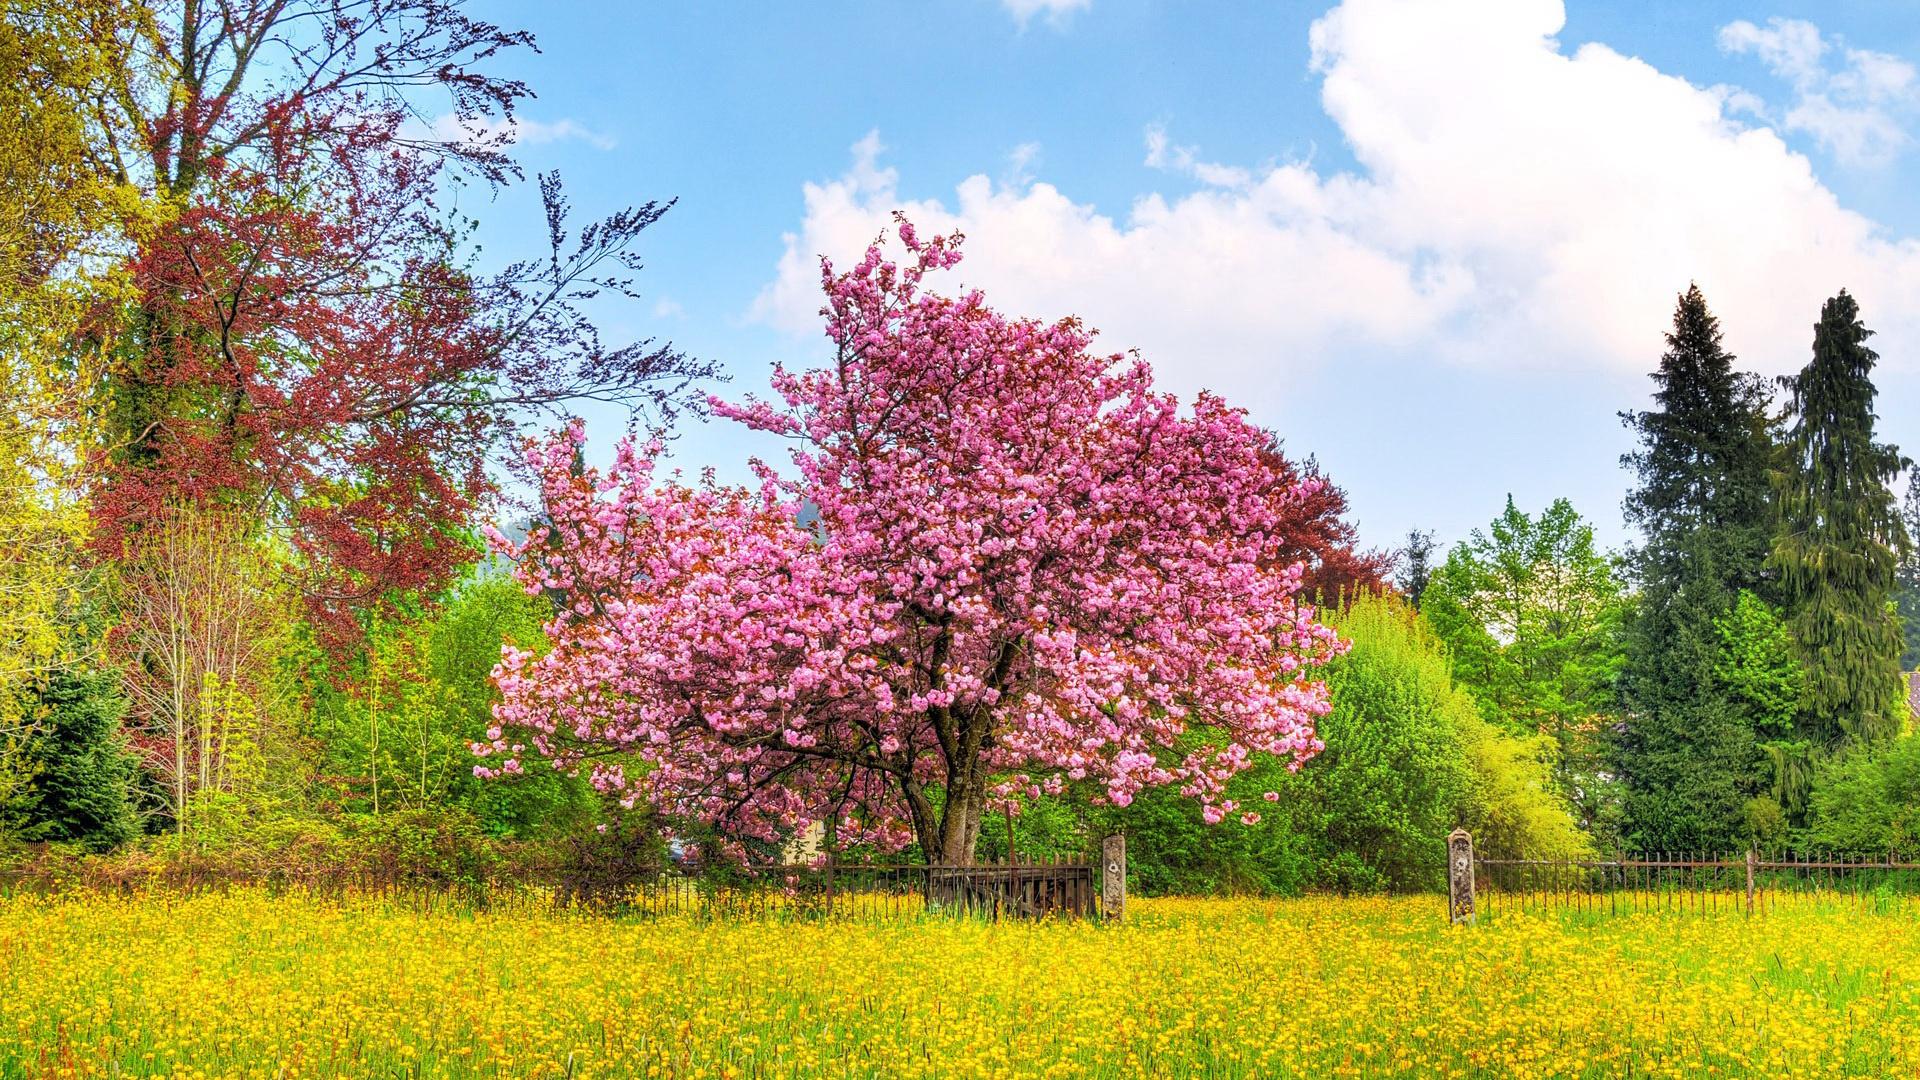 картинки, весна, цвета радуги, цветы, обои, красота